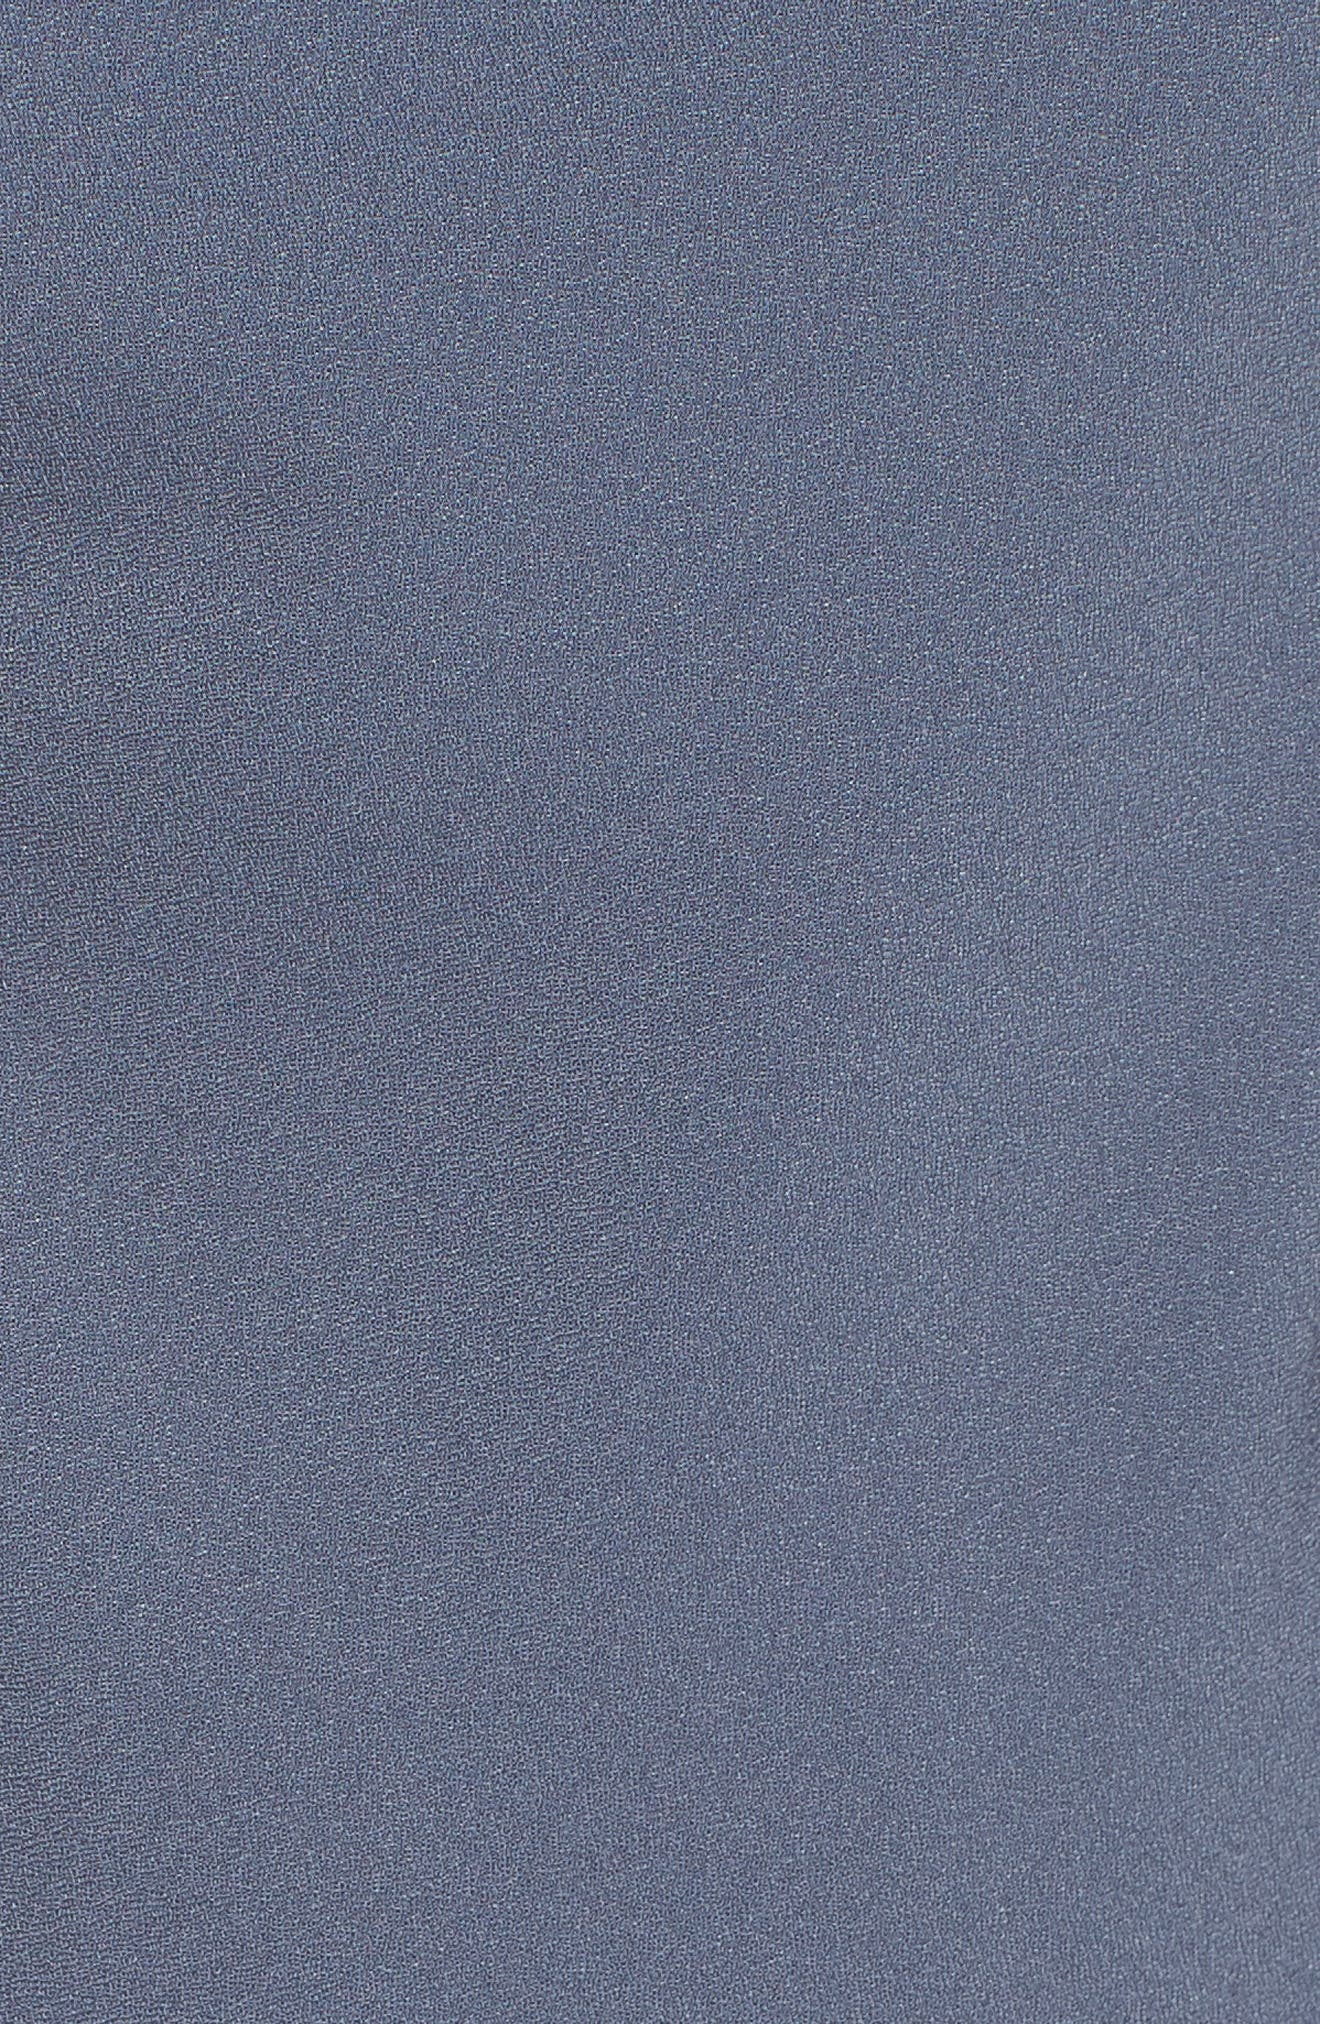 Cowl Neck Midi Dress,                             Alternate thumbnail 5, color,                             Grey Grisaille